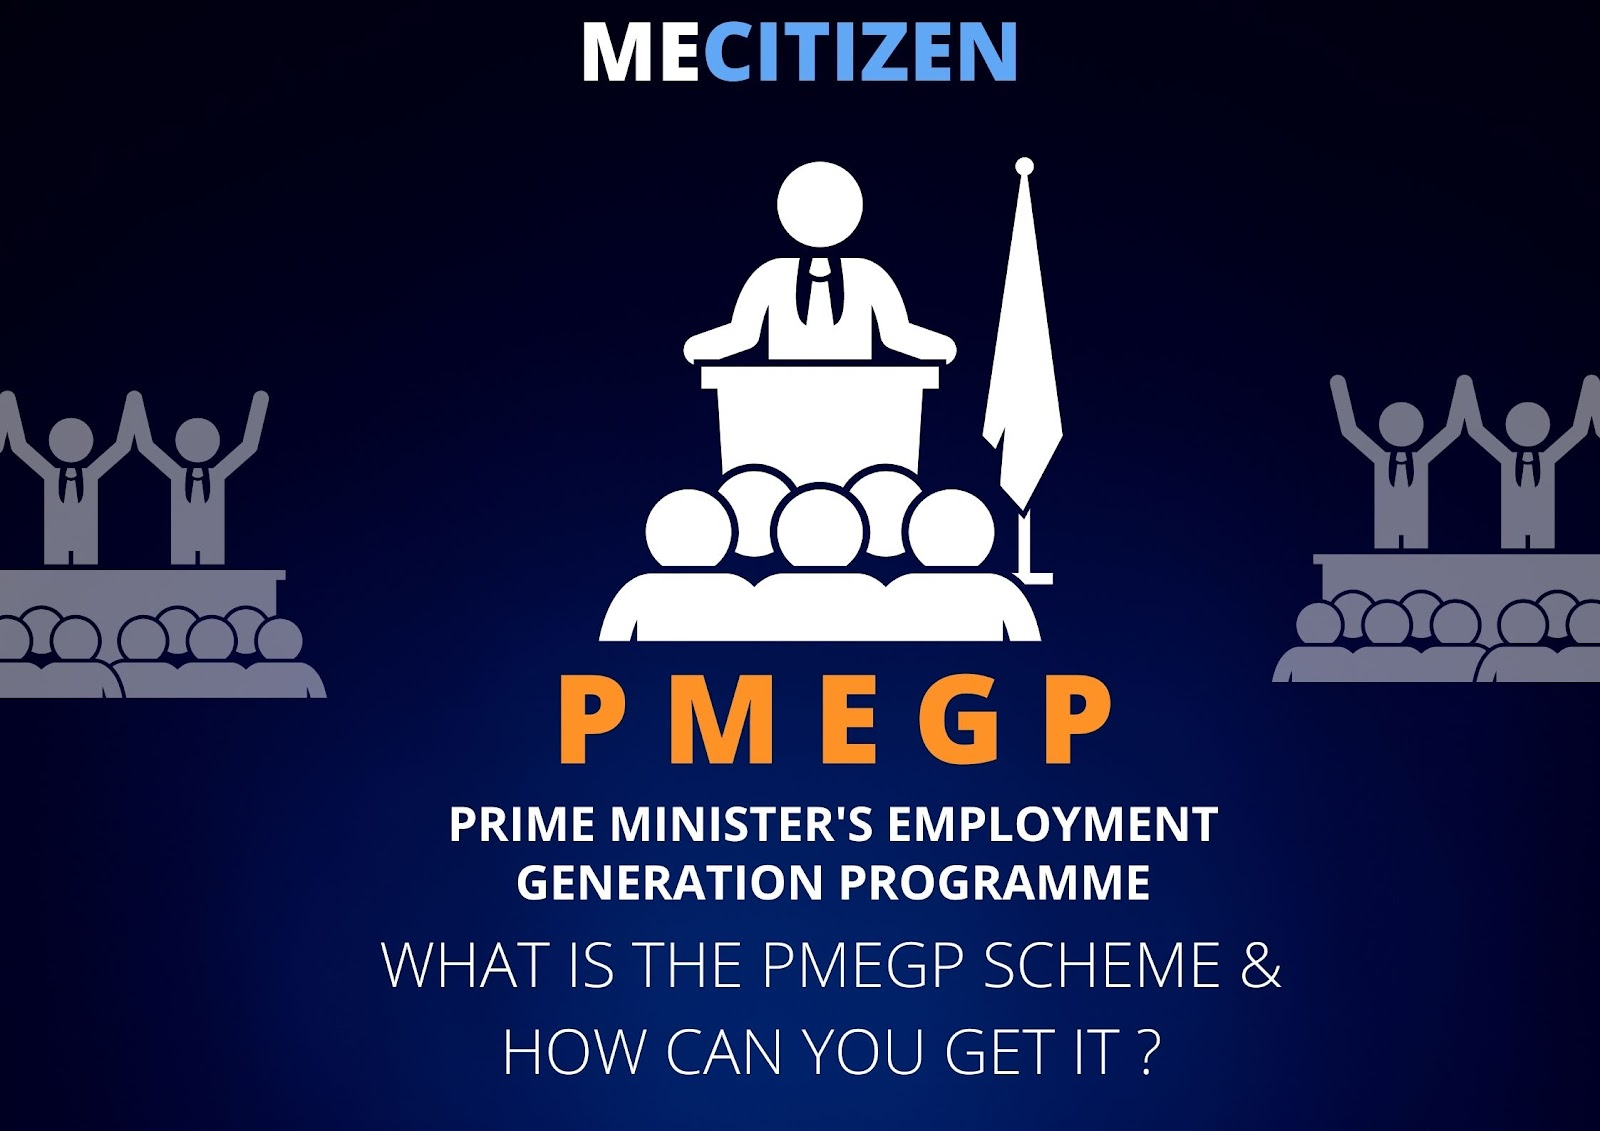 PMEGP Scheme